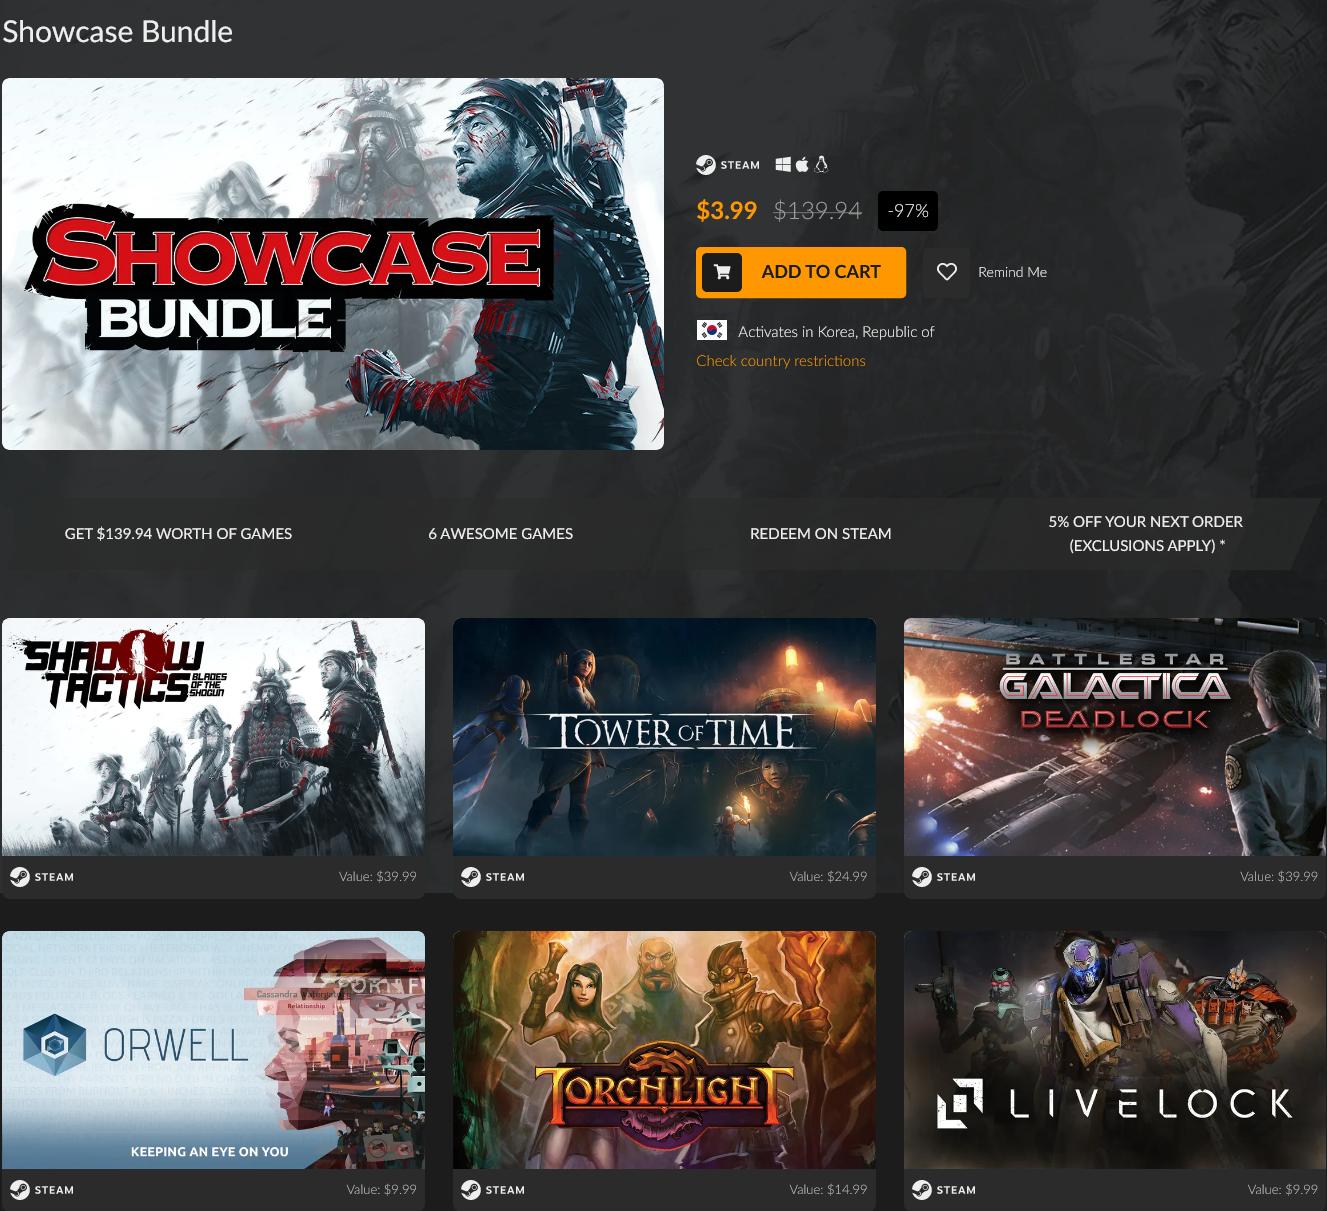 Screenshot 2021-09-24 at 00-14-58 Showcase Bundle Steam Game Bundle Fanatical.png